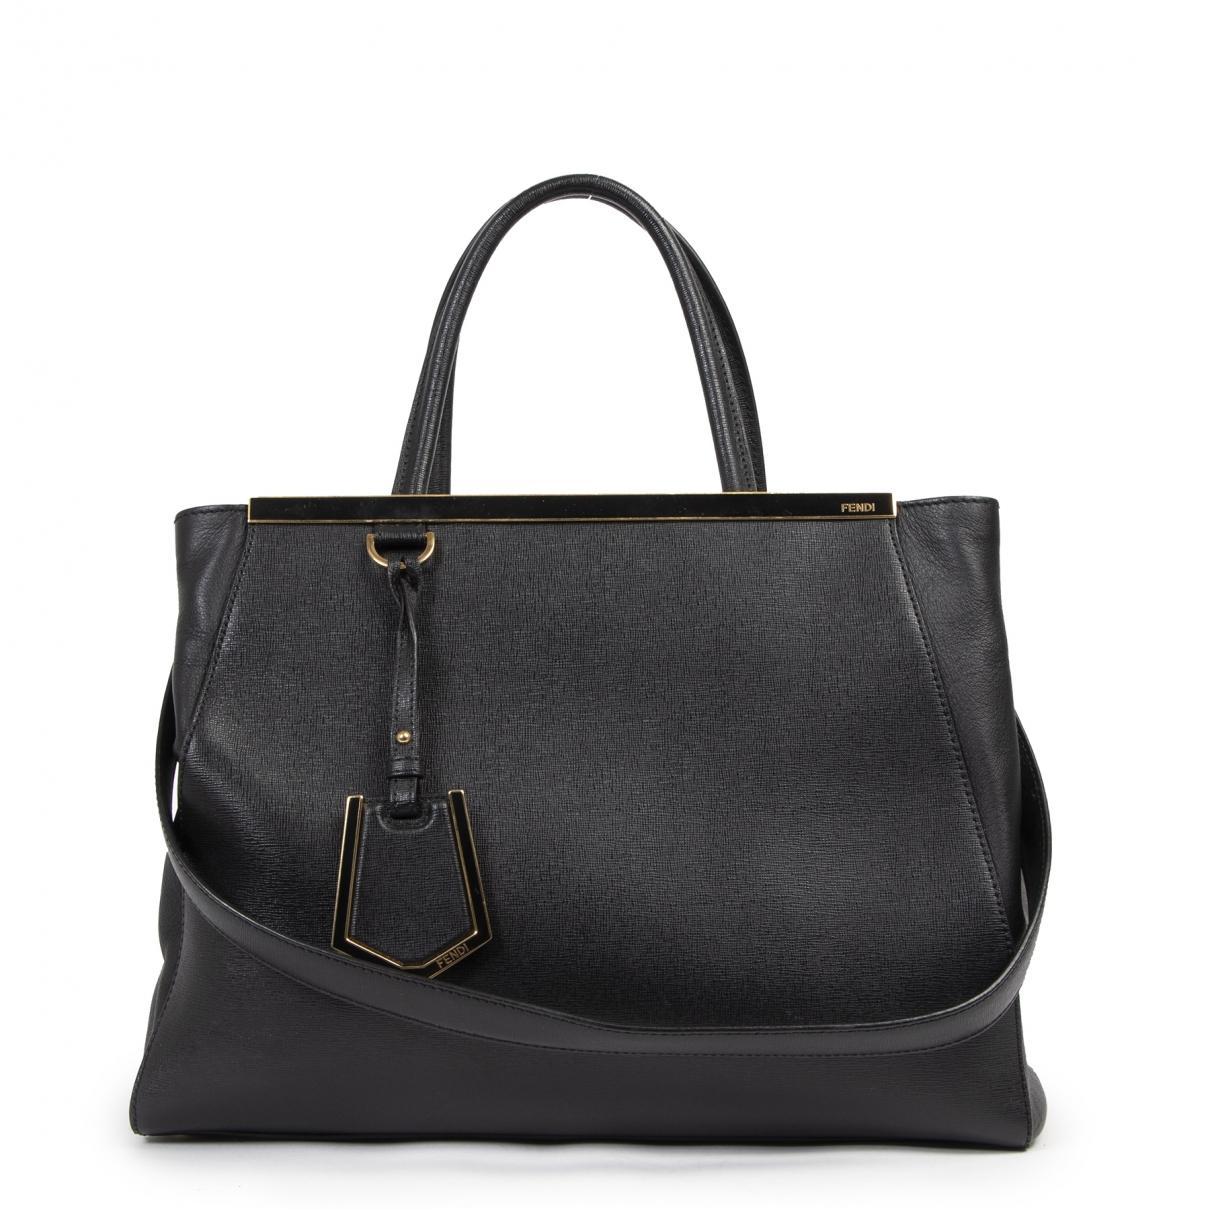 Fendi 2Jours Handtasche in  Schwarz Leder